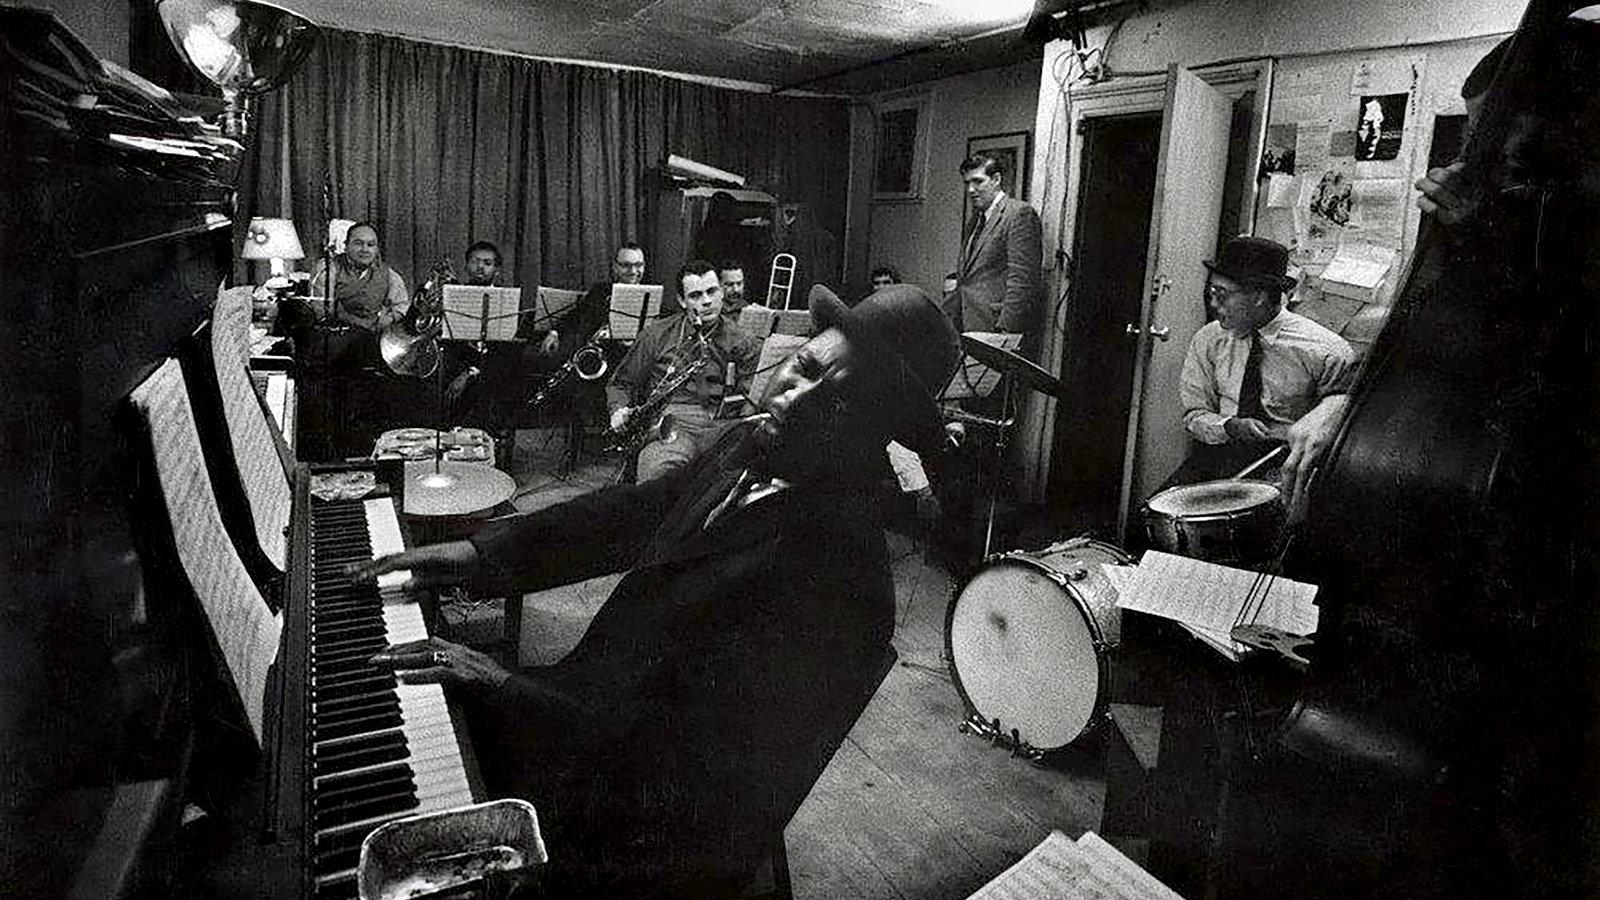 Review The Jazz Loft According To W Eugene Smith